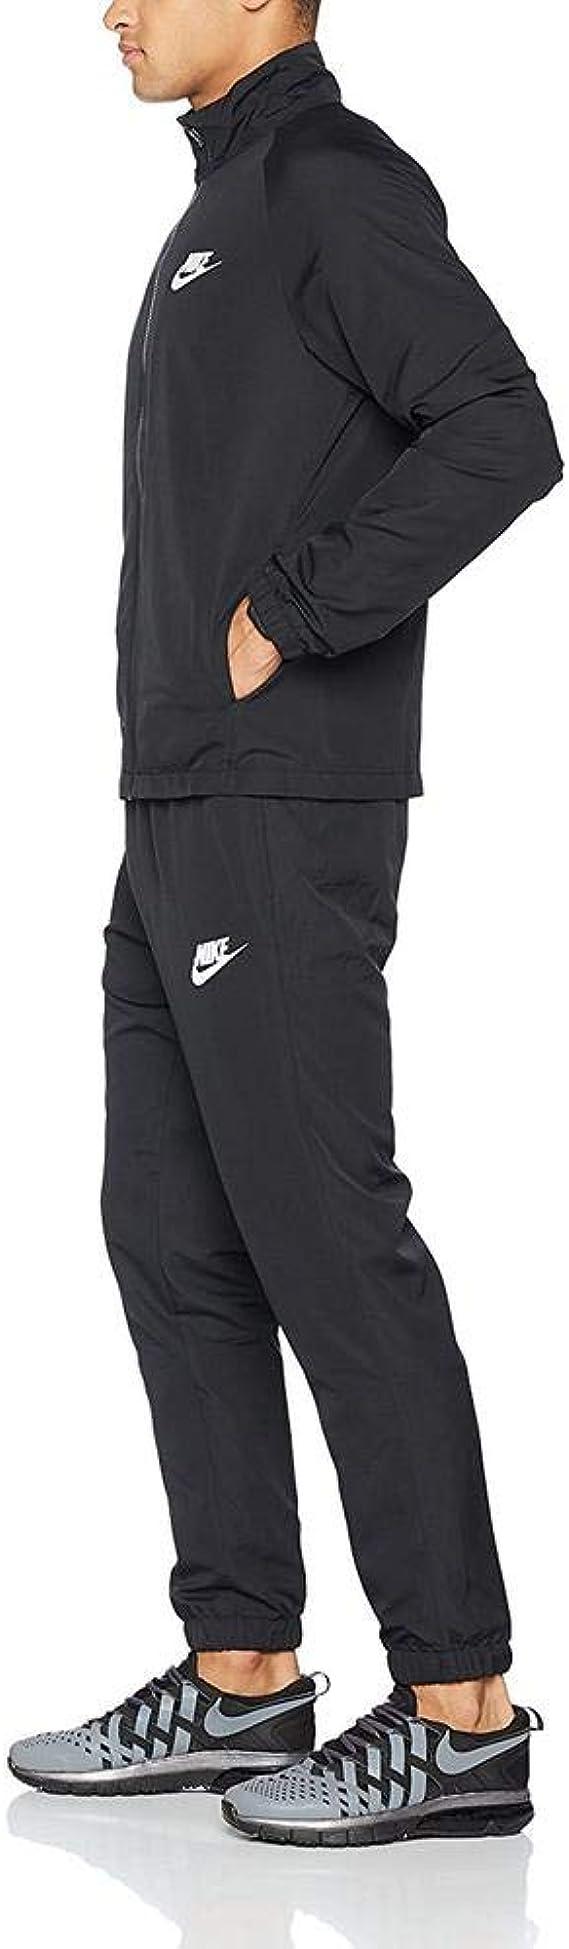 Nike Sportswear Woven Basic Chándal, Hombre: Amazon.es: Ropa y ...